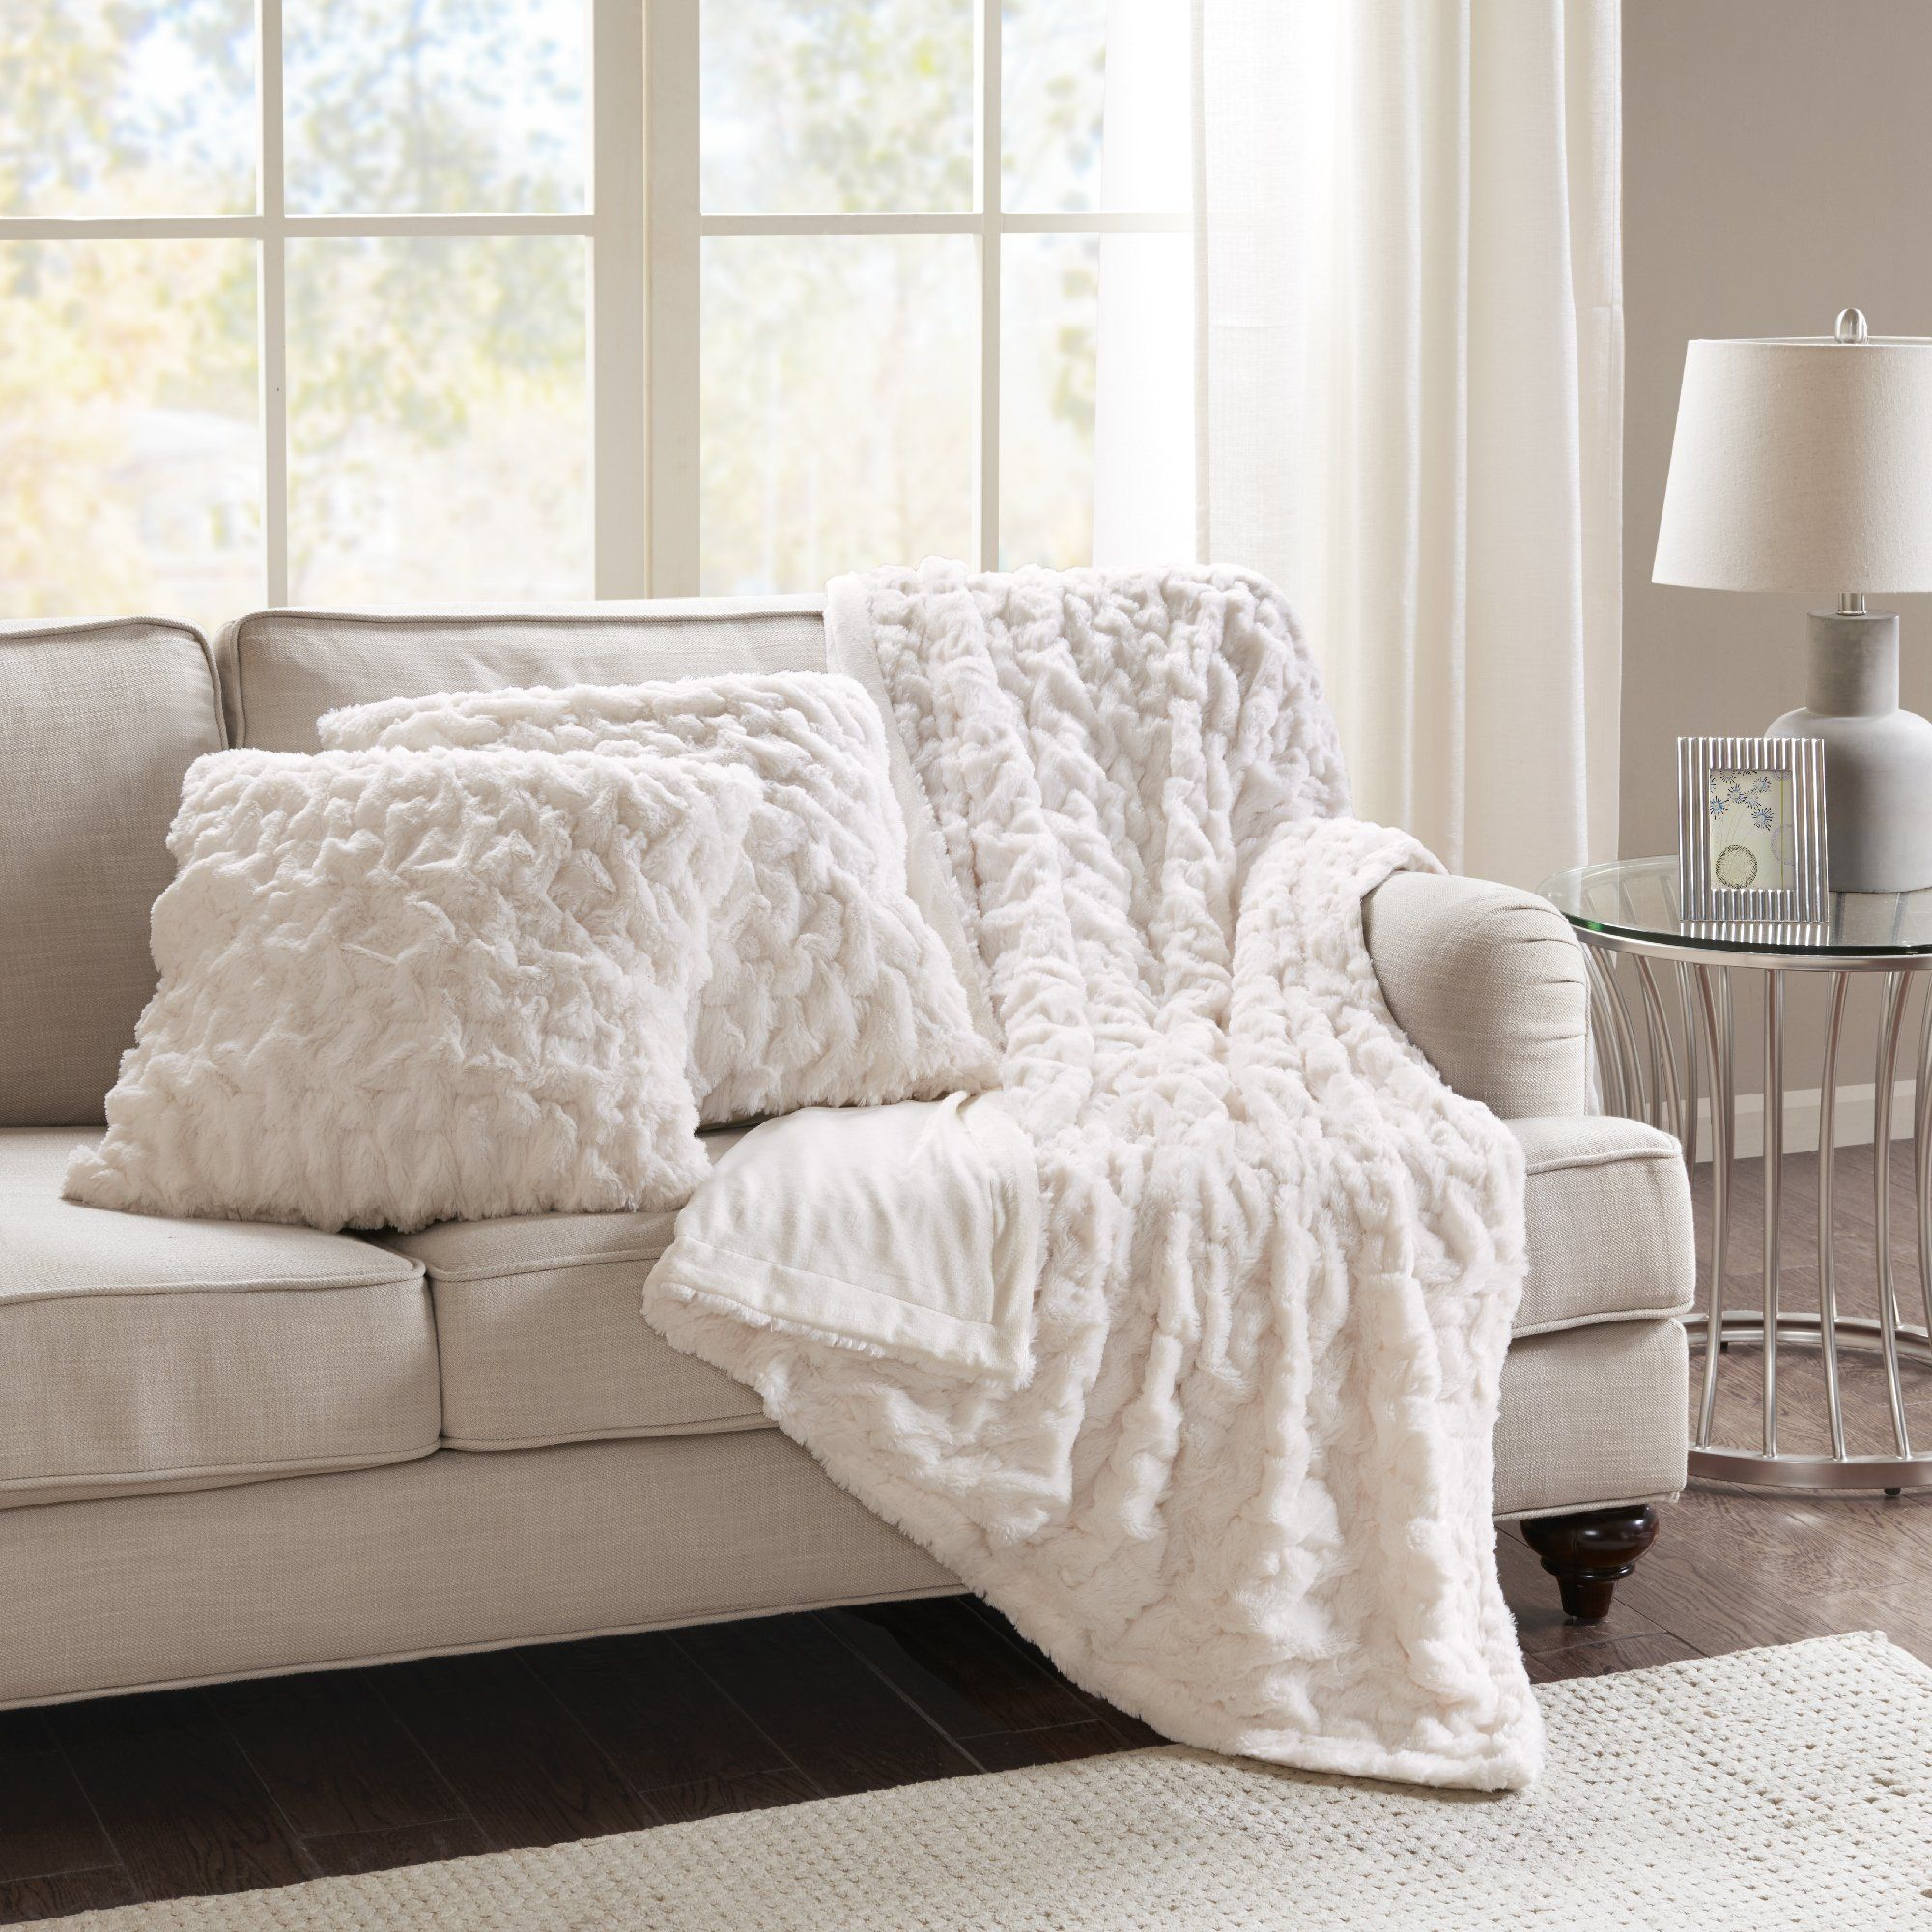 Strange Buy Comfort Spaces Faux Fur Throw Blanket Set Fluffy Plush Bralicious Painted Fabric Chair Ideas Braliciousco